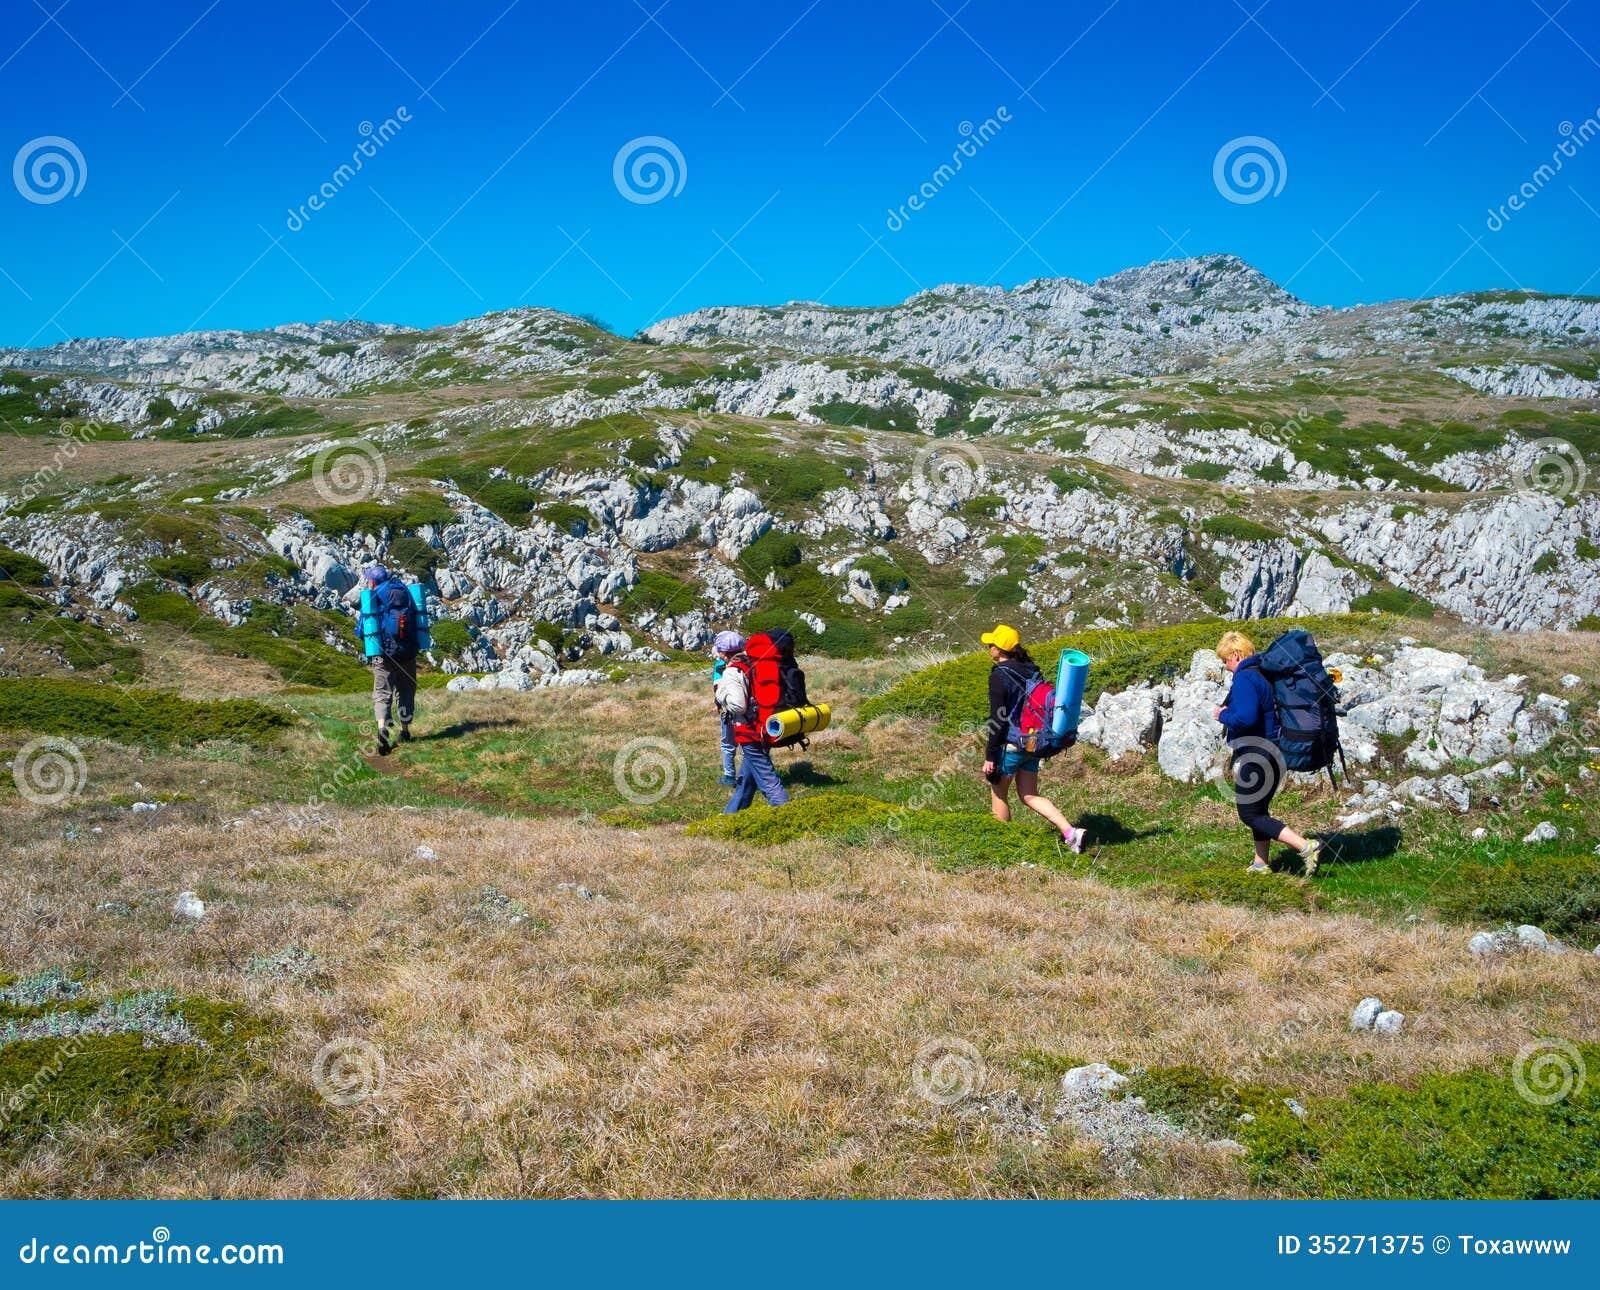 Trekking Group 92